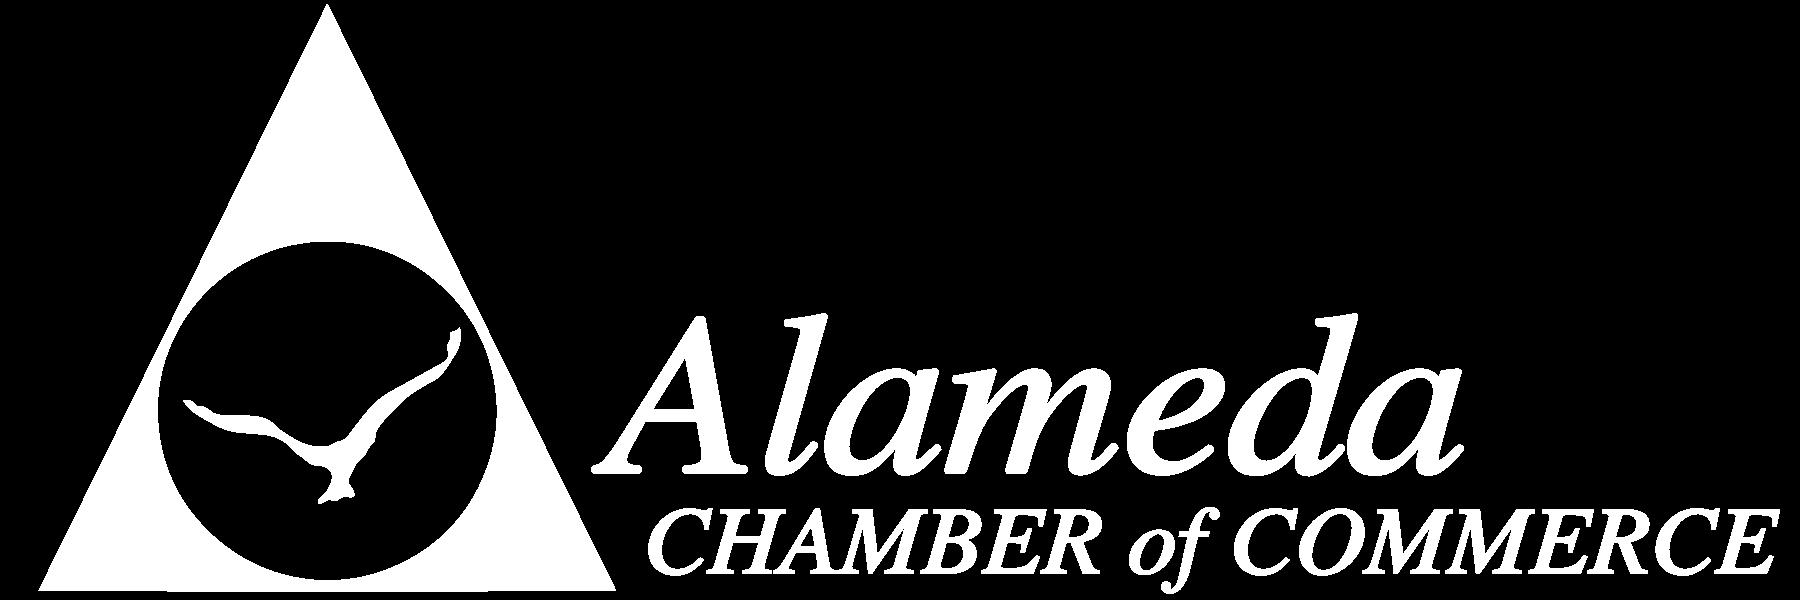 AlamedaCC_logo_vector_white